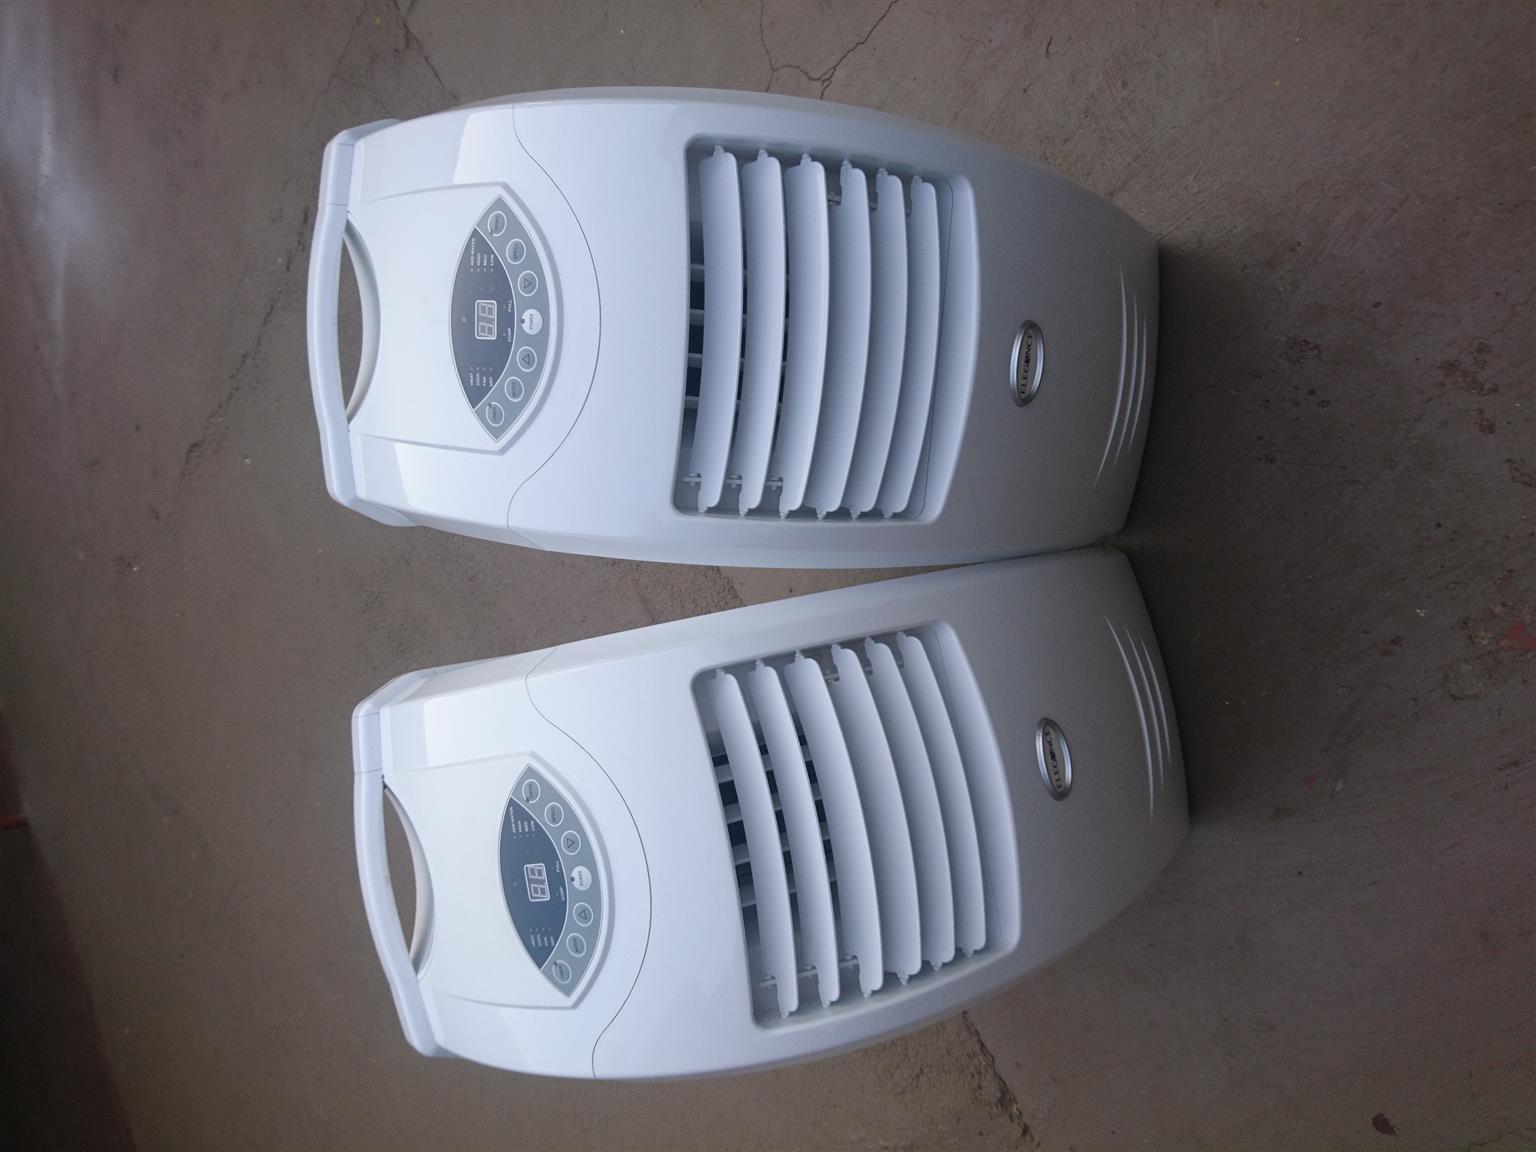 2 x 12000btu portable air conditioners